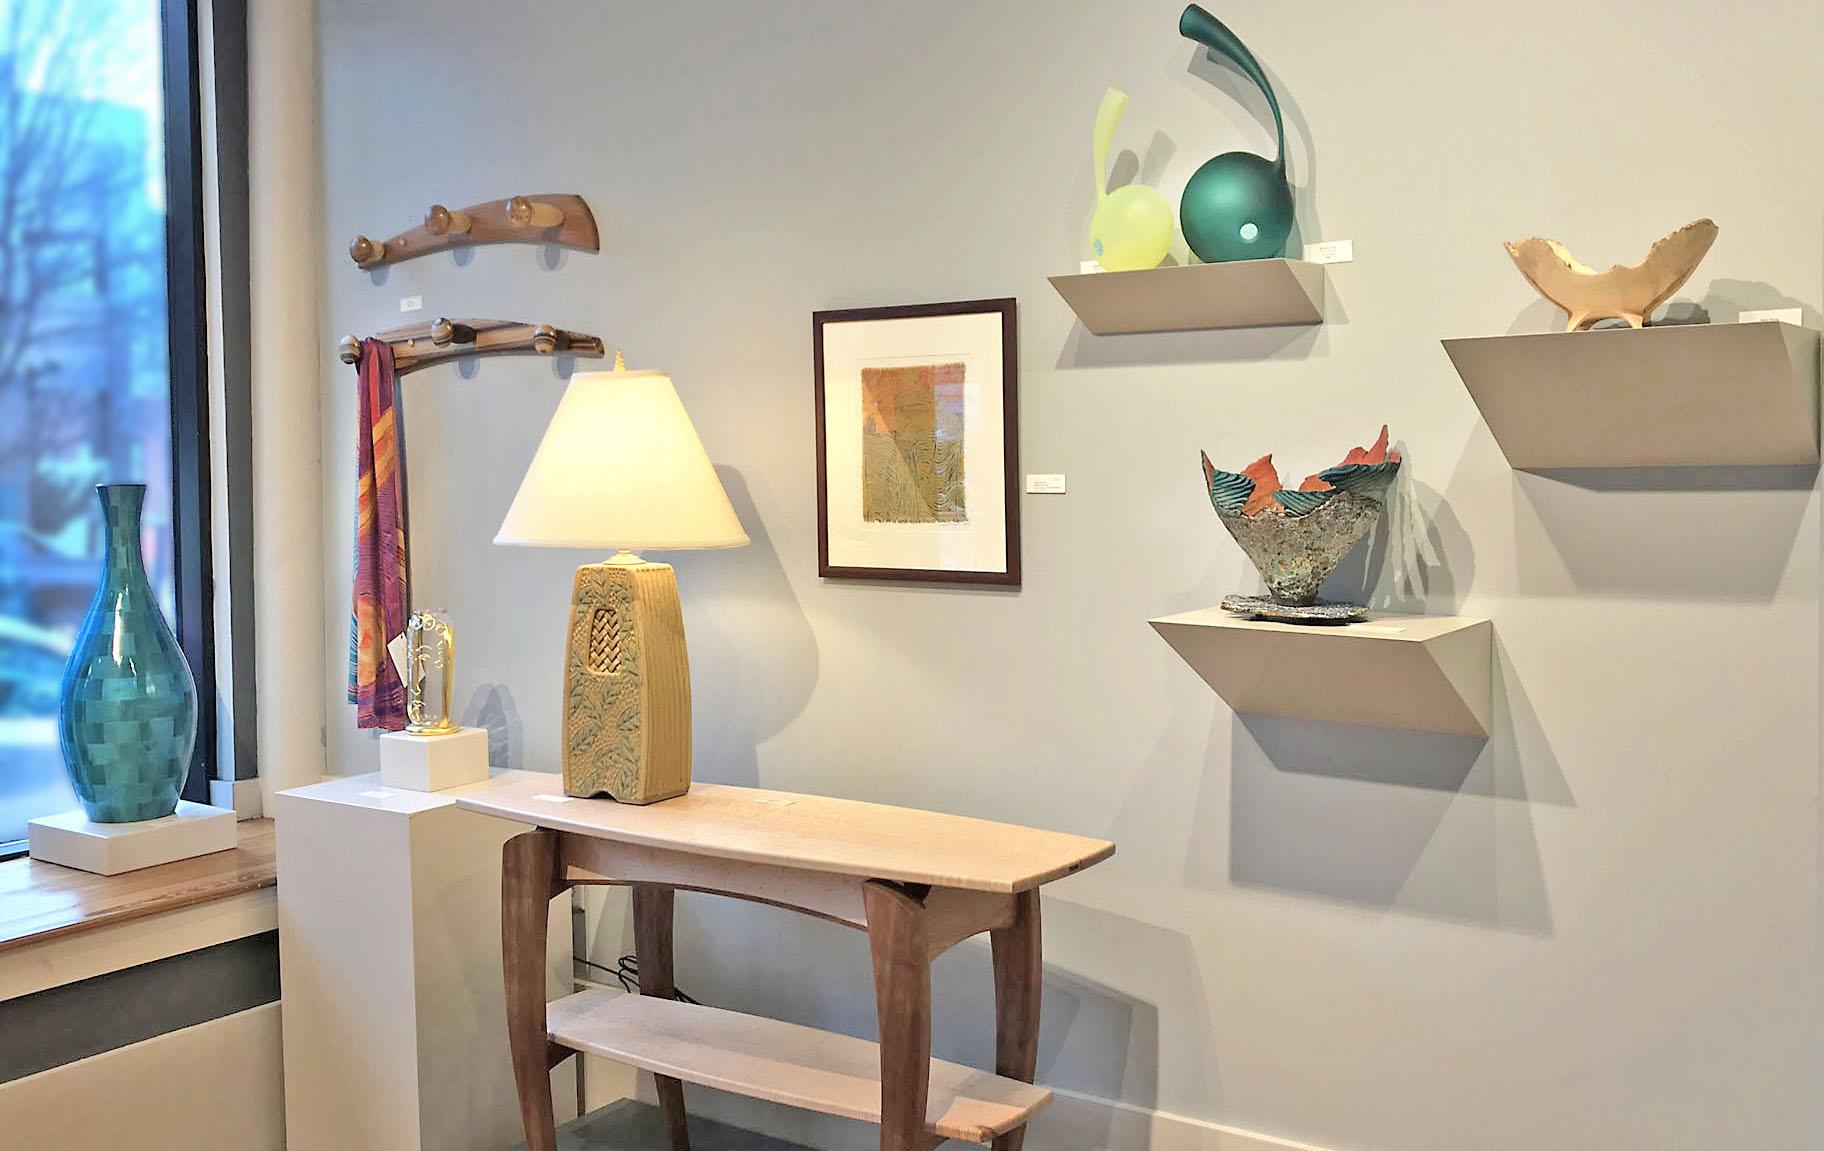 Ariel Gallery, an Asheville art gallery focusing on fine craft